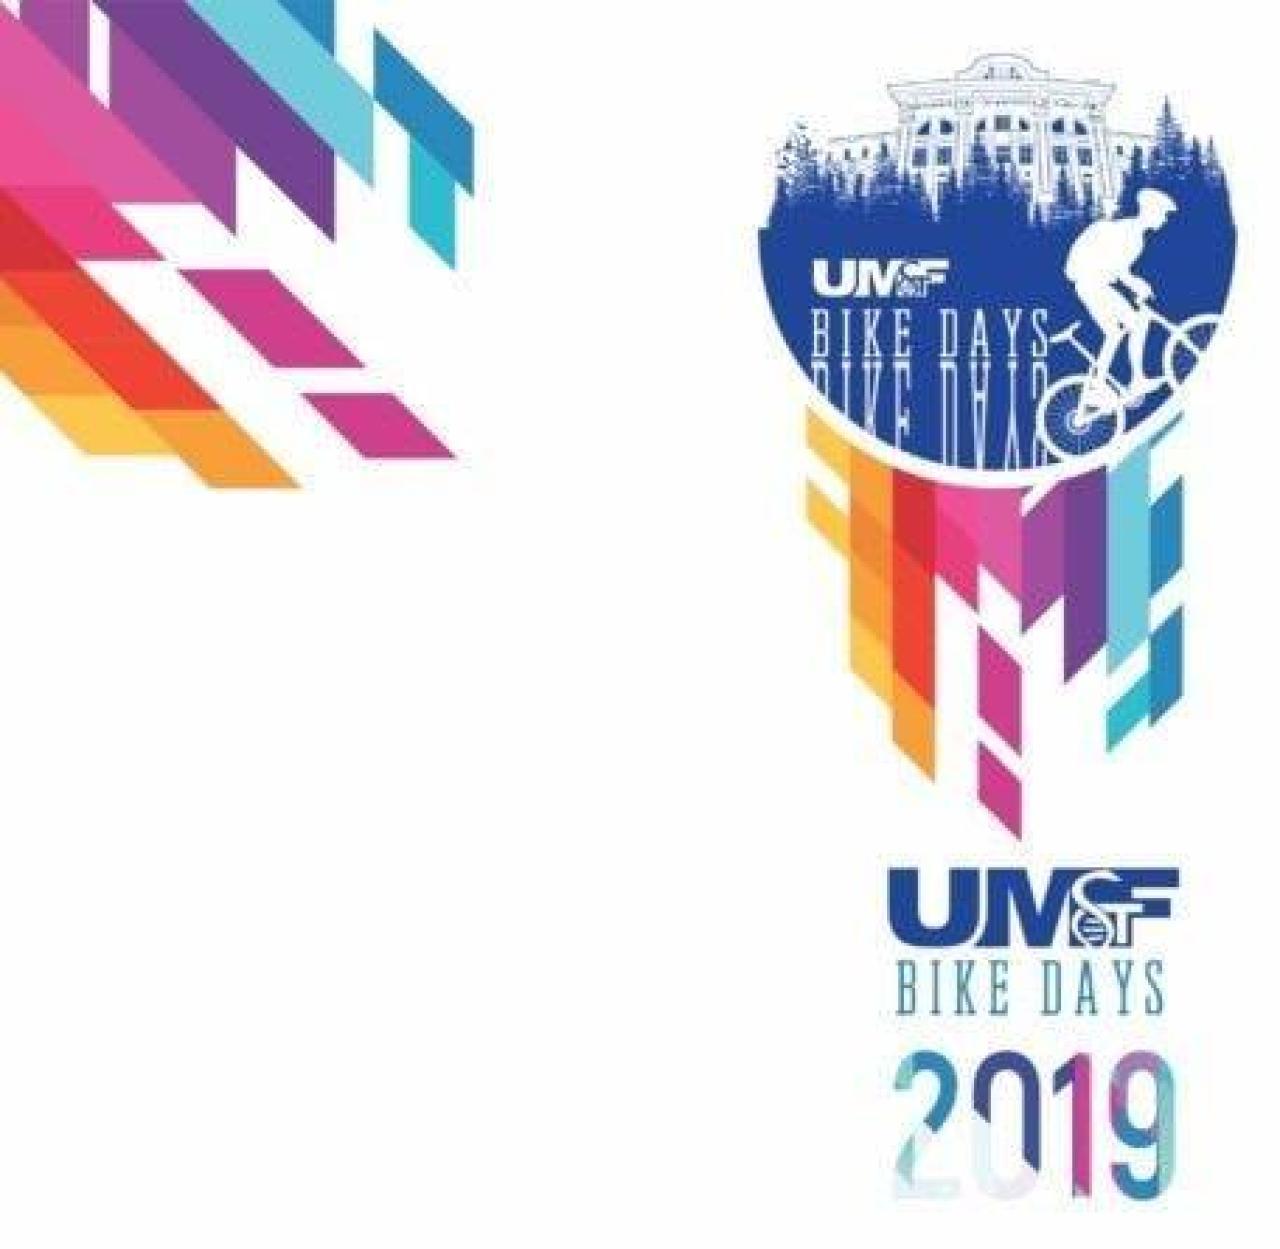 UMFST Bike Days 2019 - XCP - Amatori